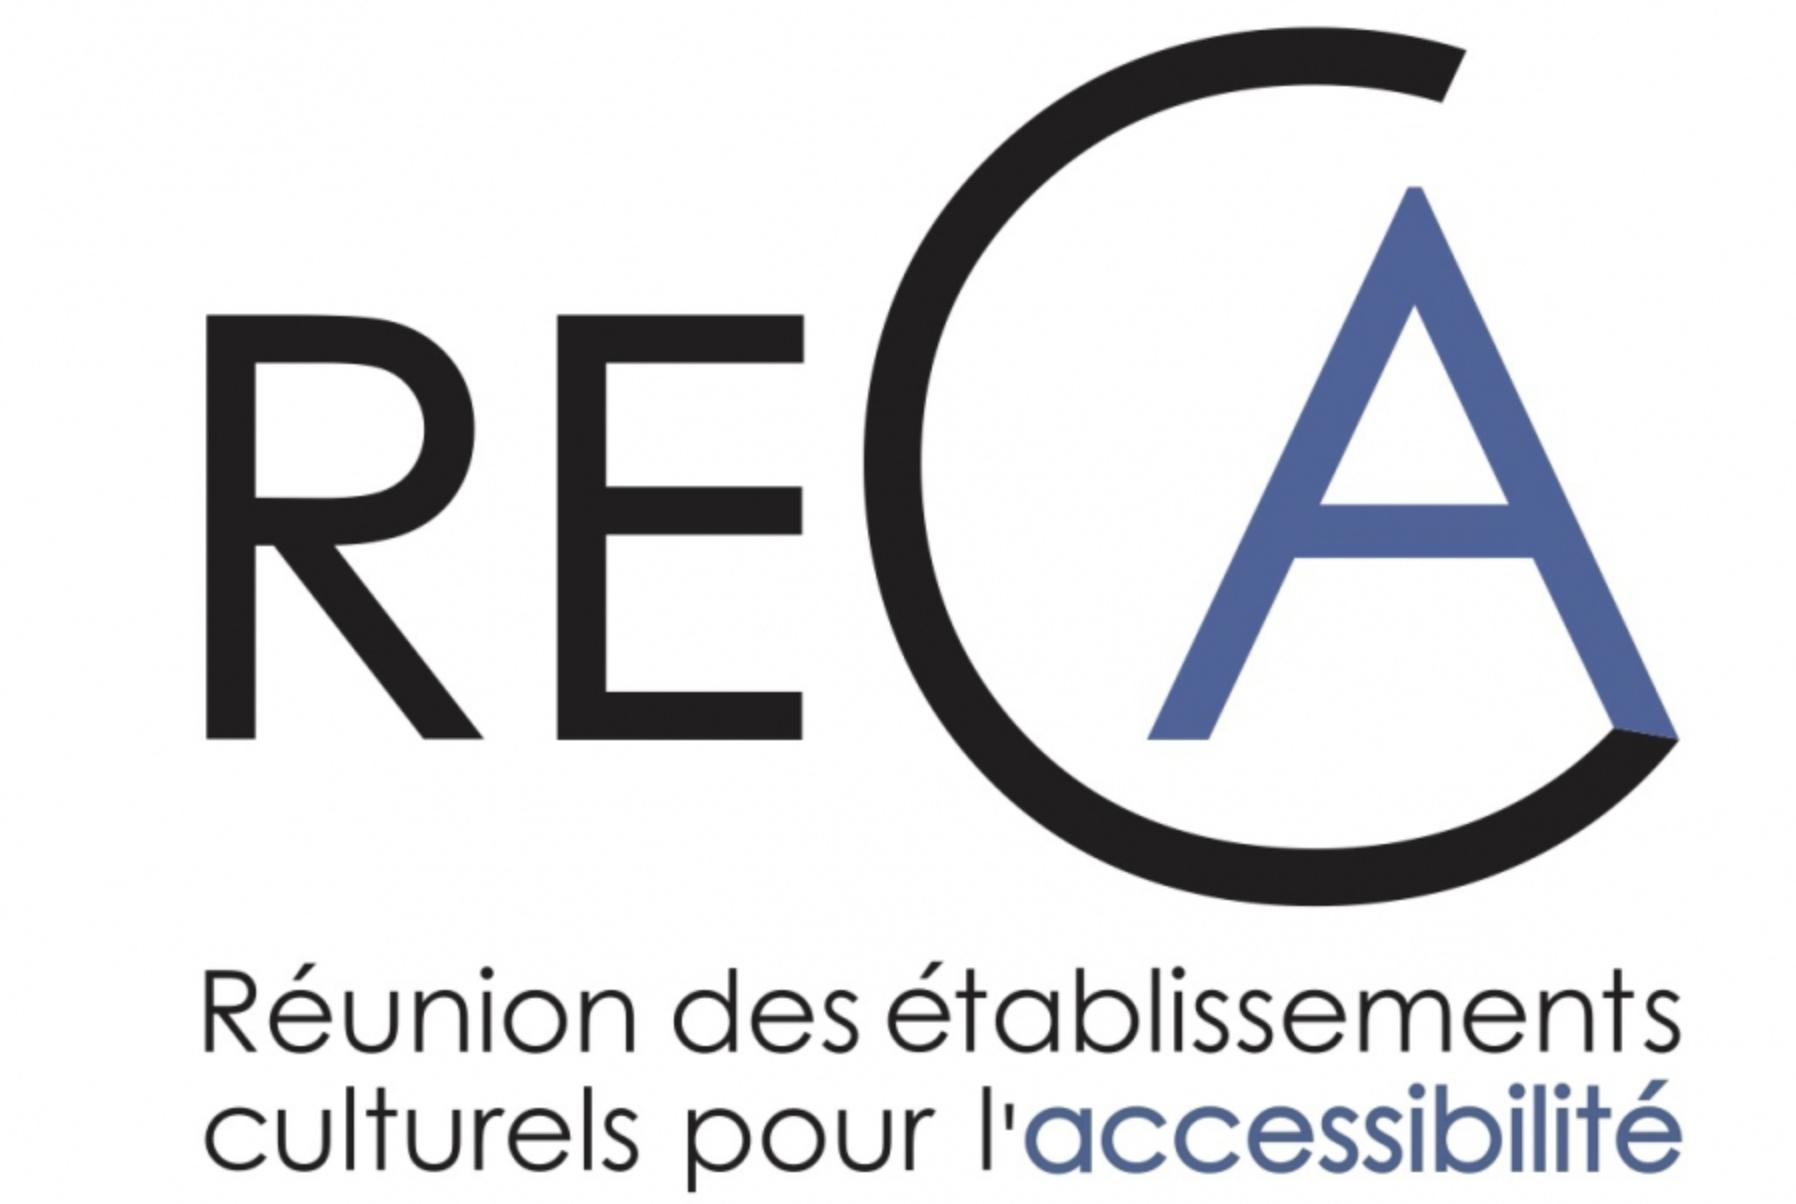 logo_RECA